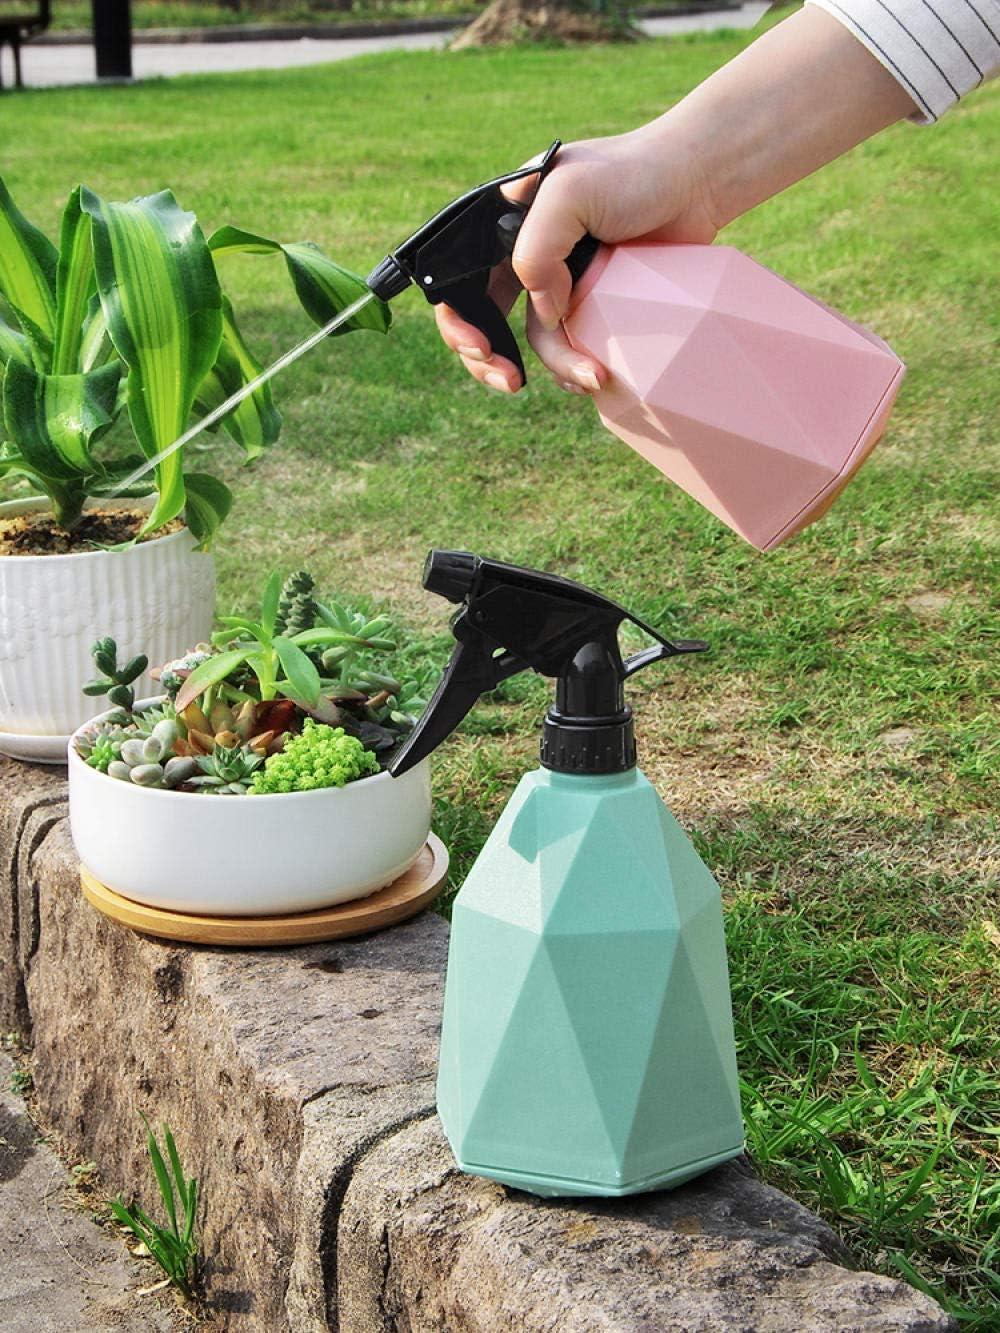 Botella de spray de riego neum/ático botella de spray de desinfecci/ón dom/éstica